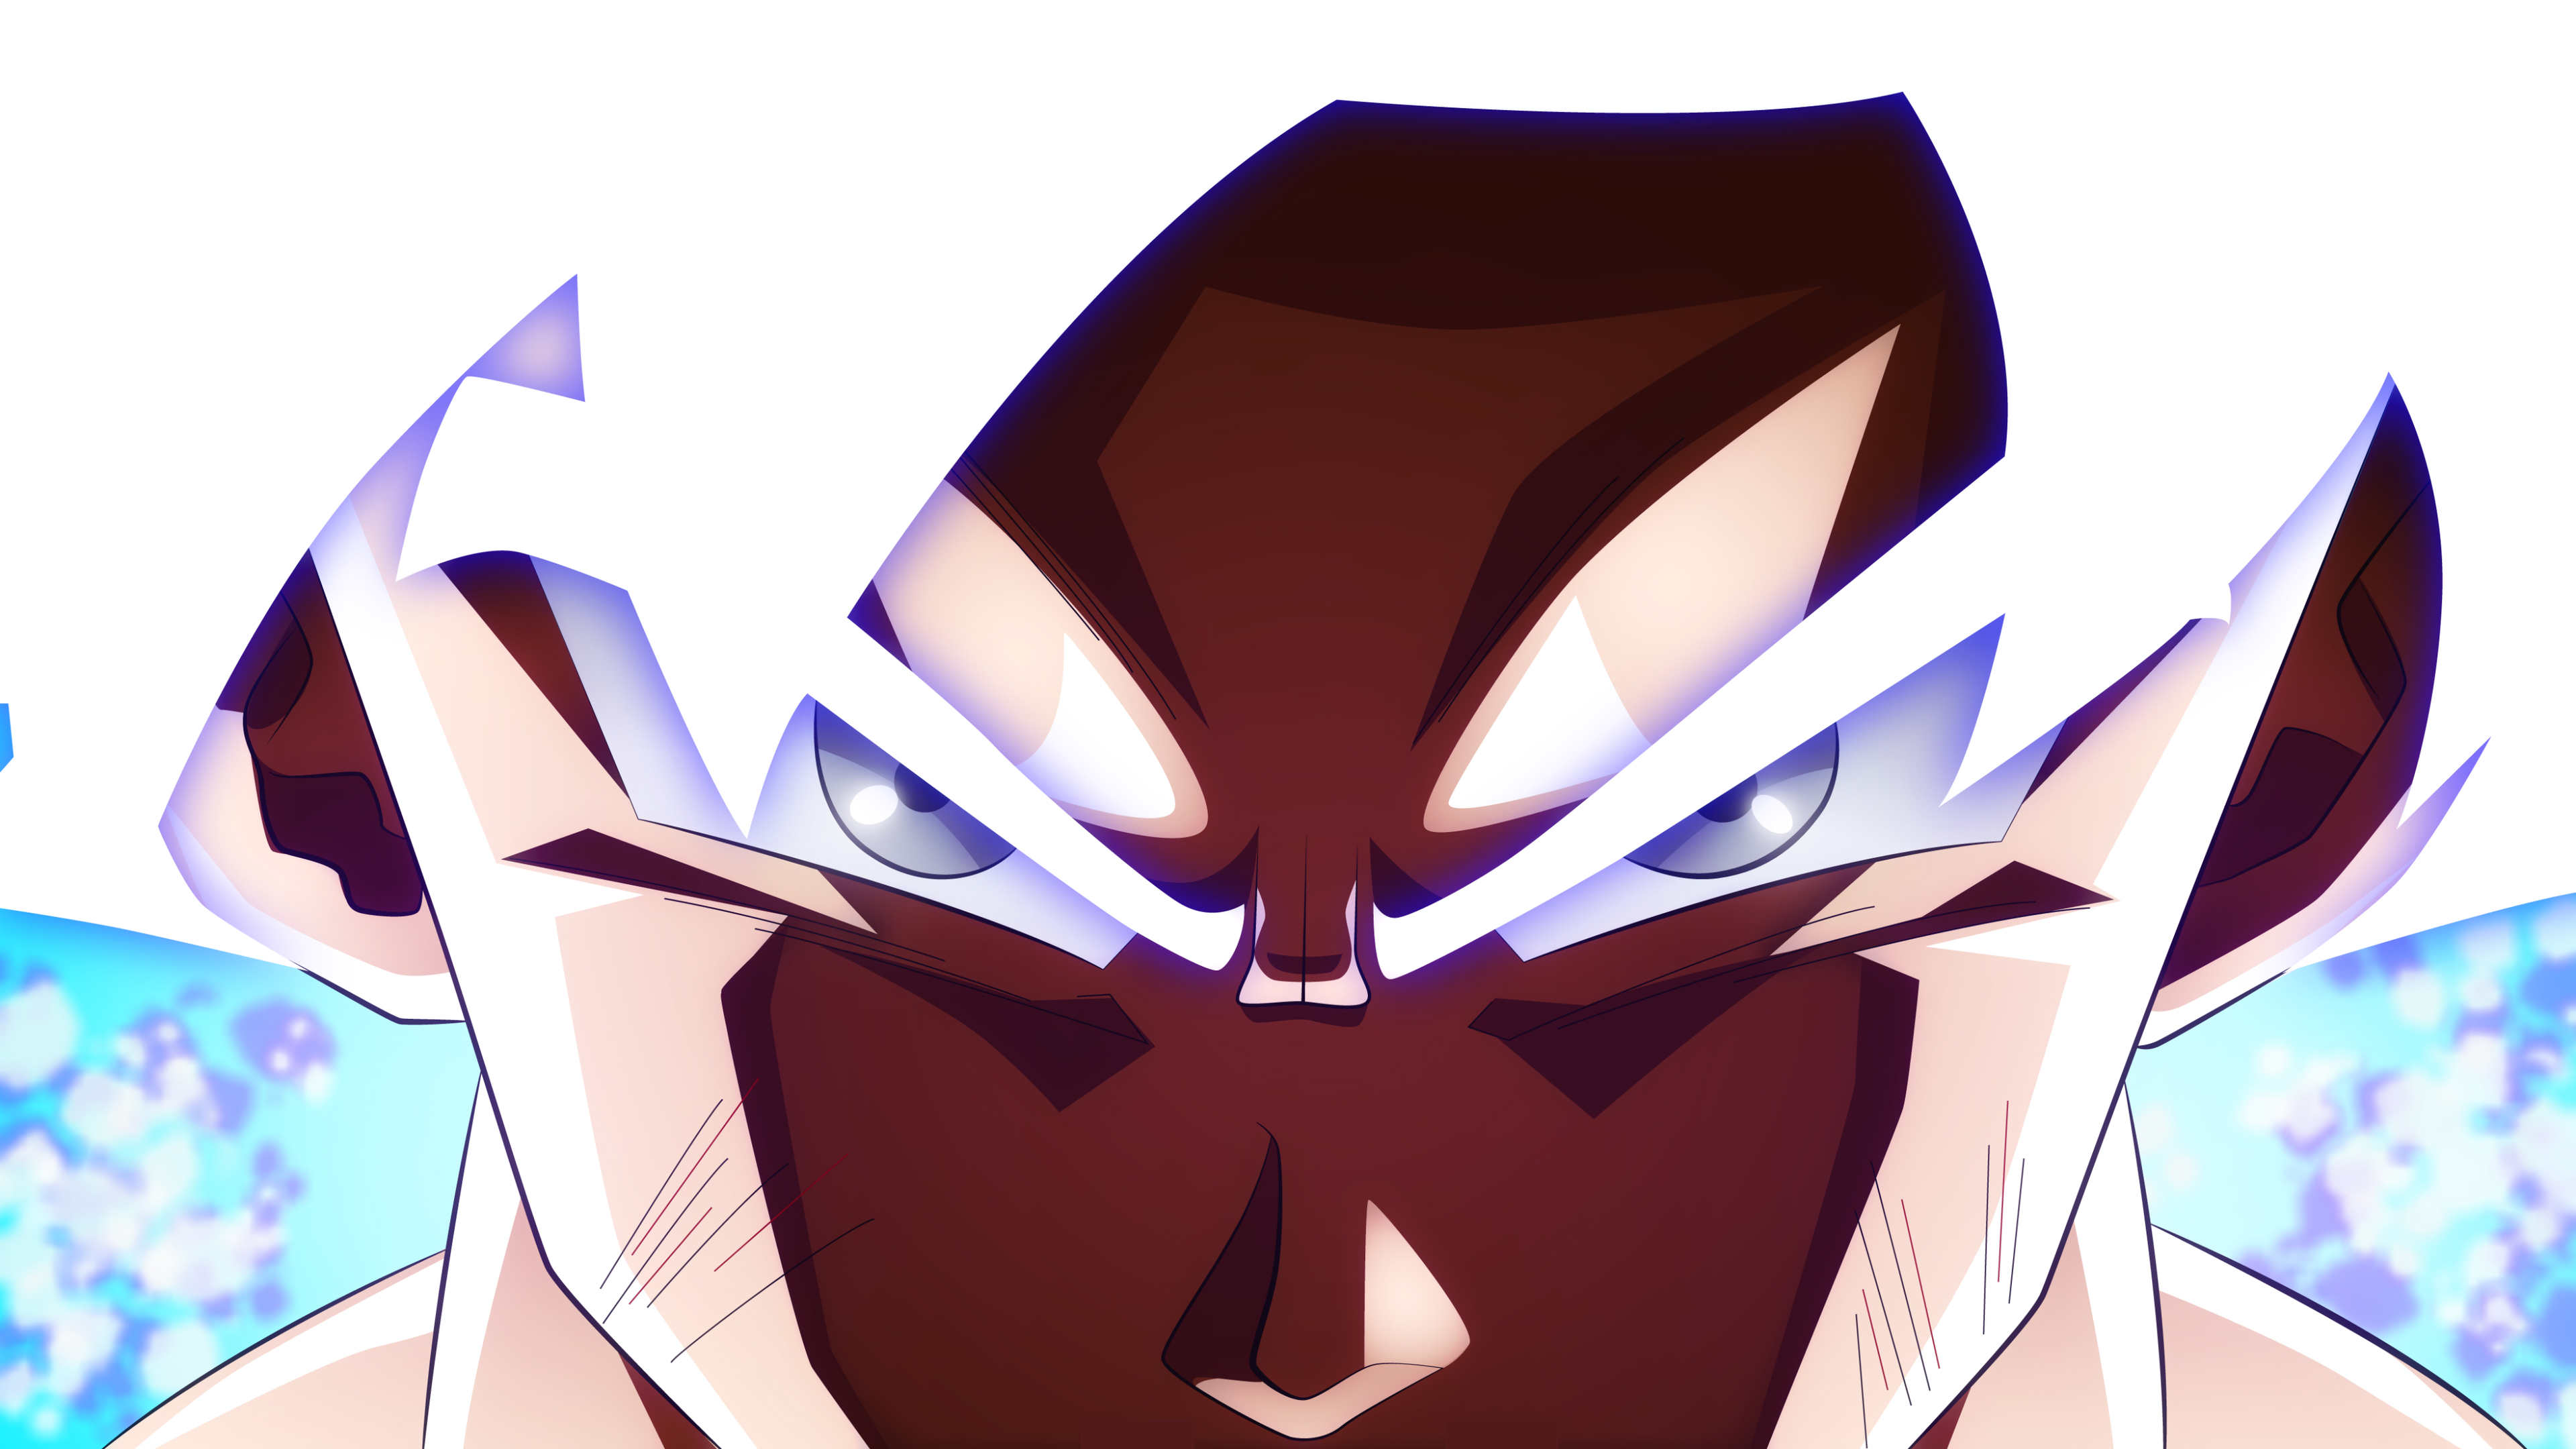 ultra instinct goku 1541974231 - Ultra Instinct Goku - hd-wallpapers, goku wallpapers, dragon ball wallpapers, dragon ball super wallpapers, anime wallpapers, 4k-wallpapers